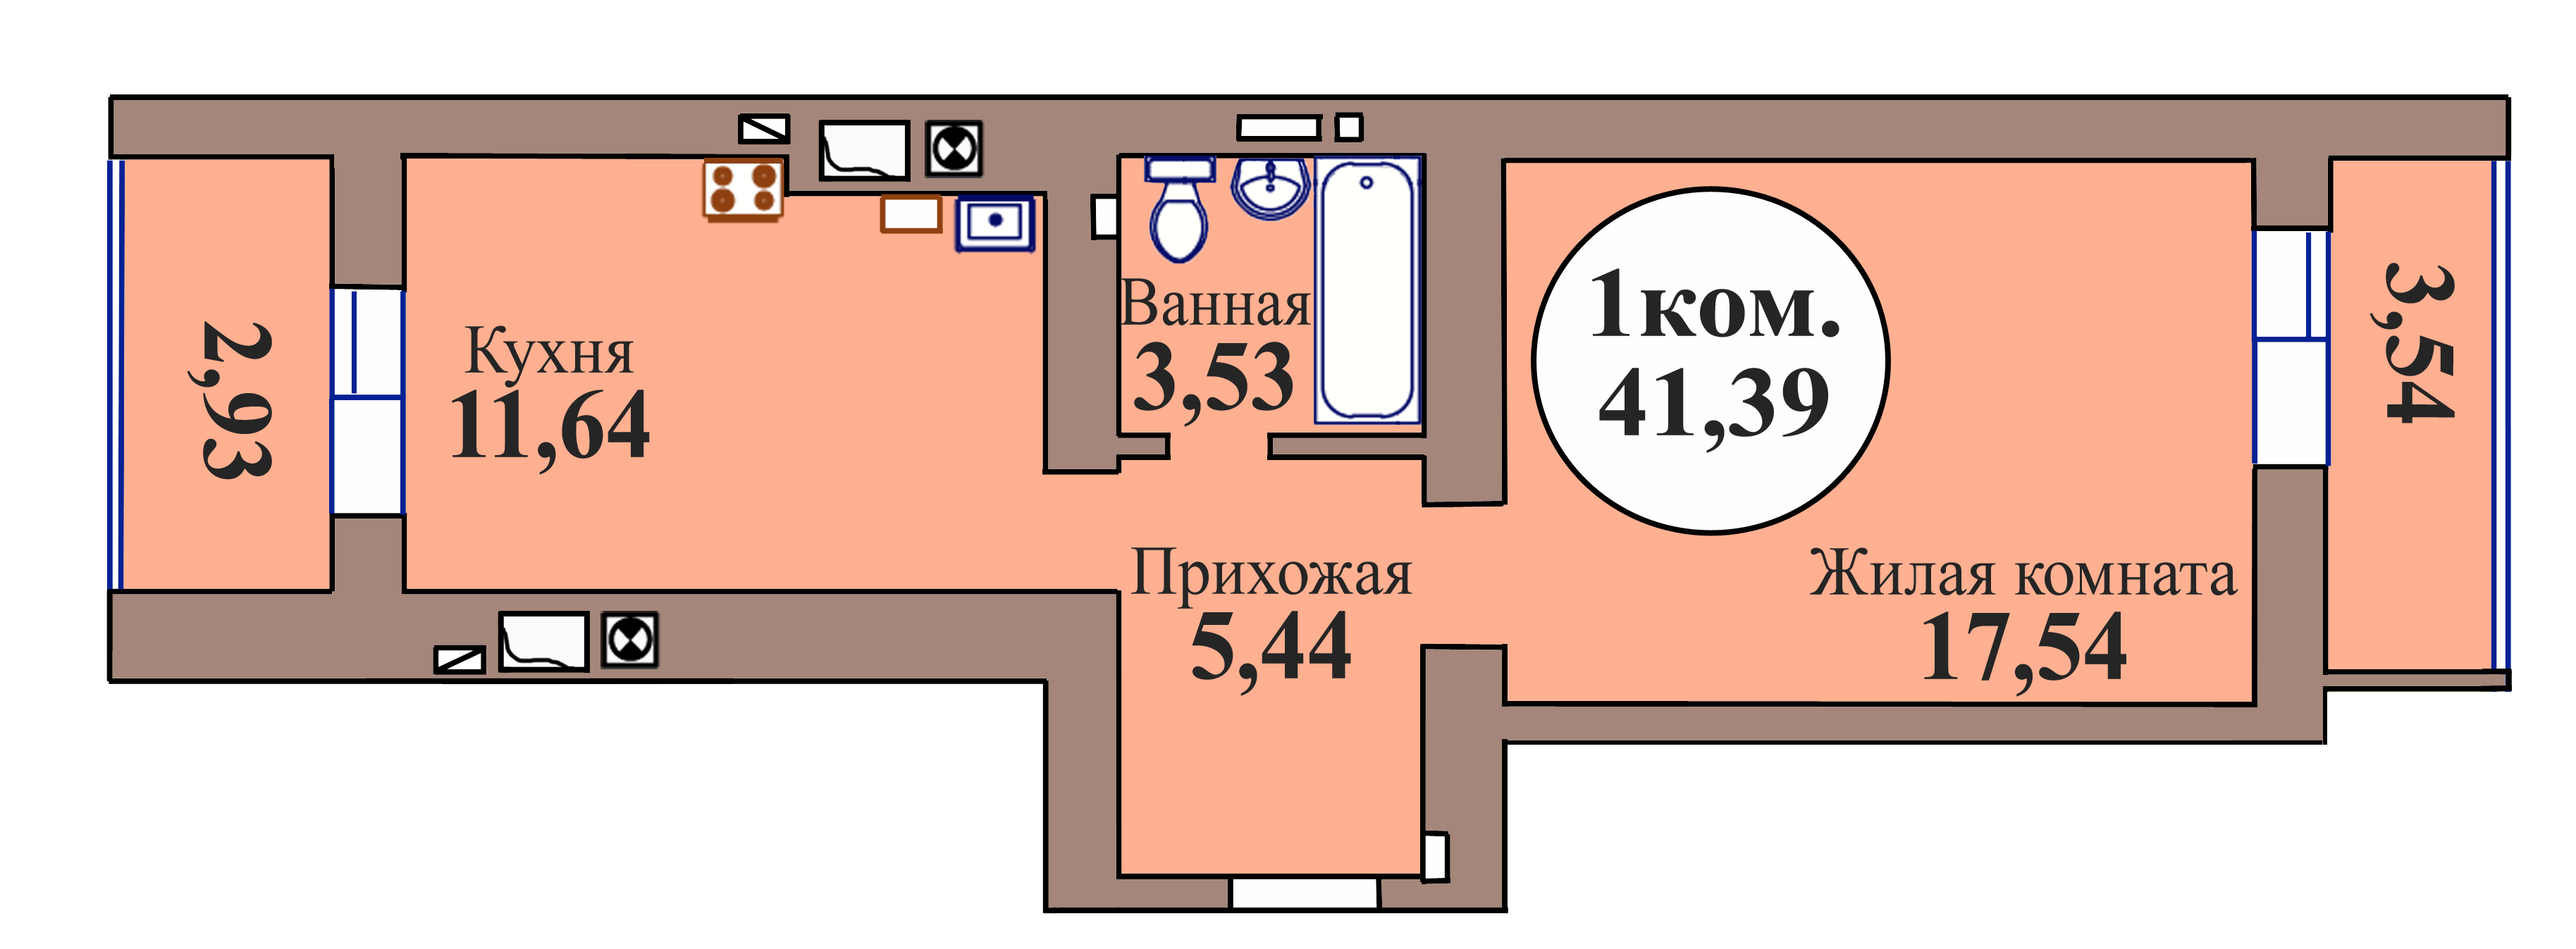 1-комн. кв. по пер. Калининградский, 5 кв. 39 в Калининграде